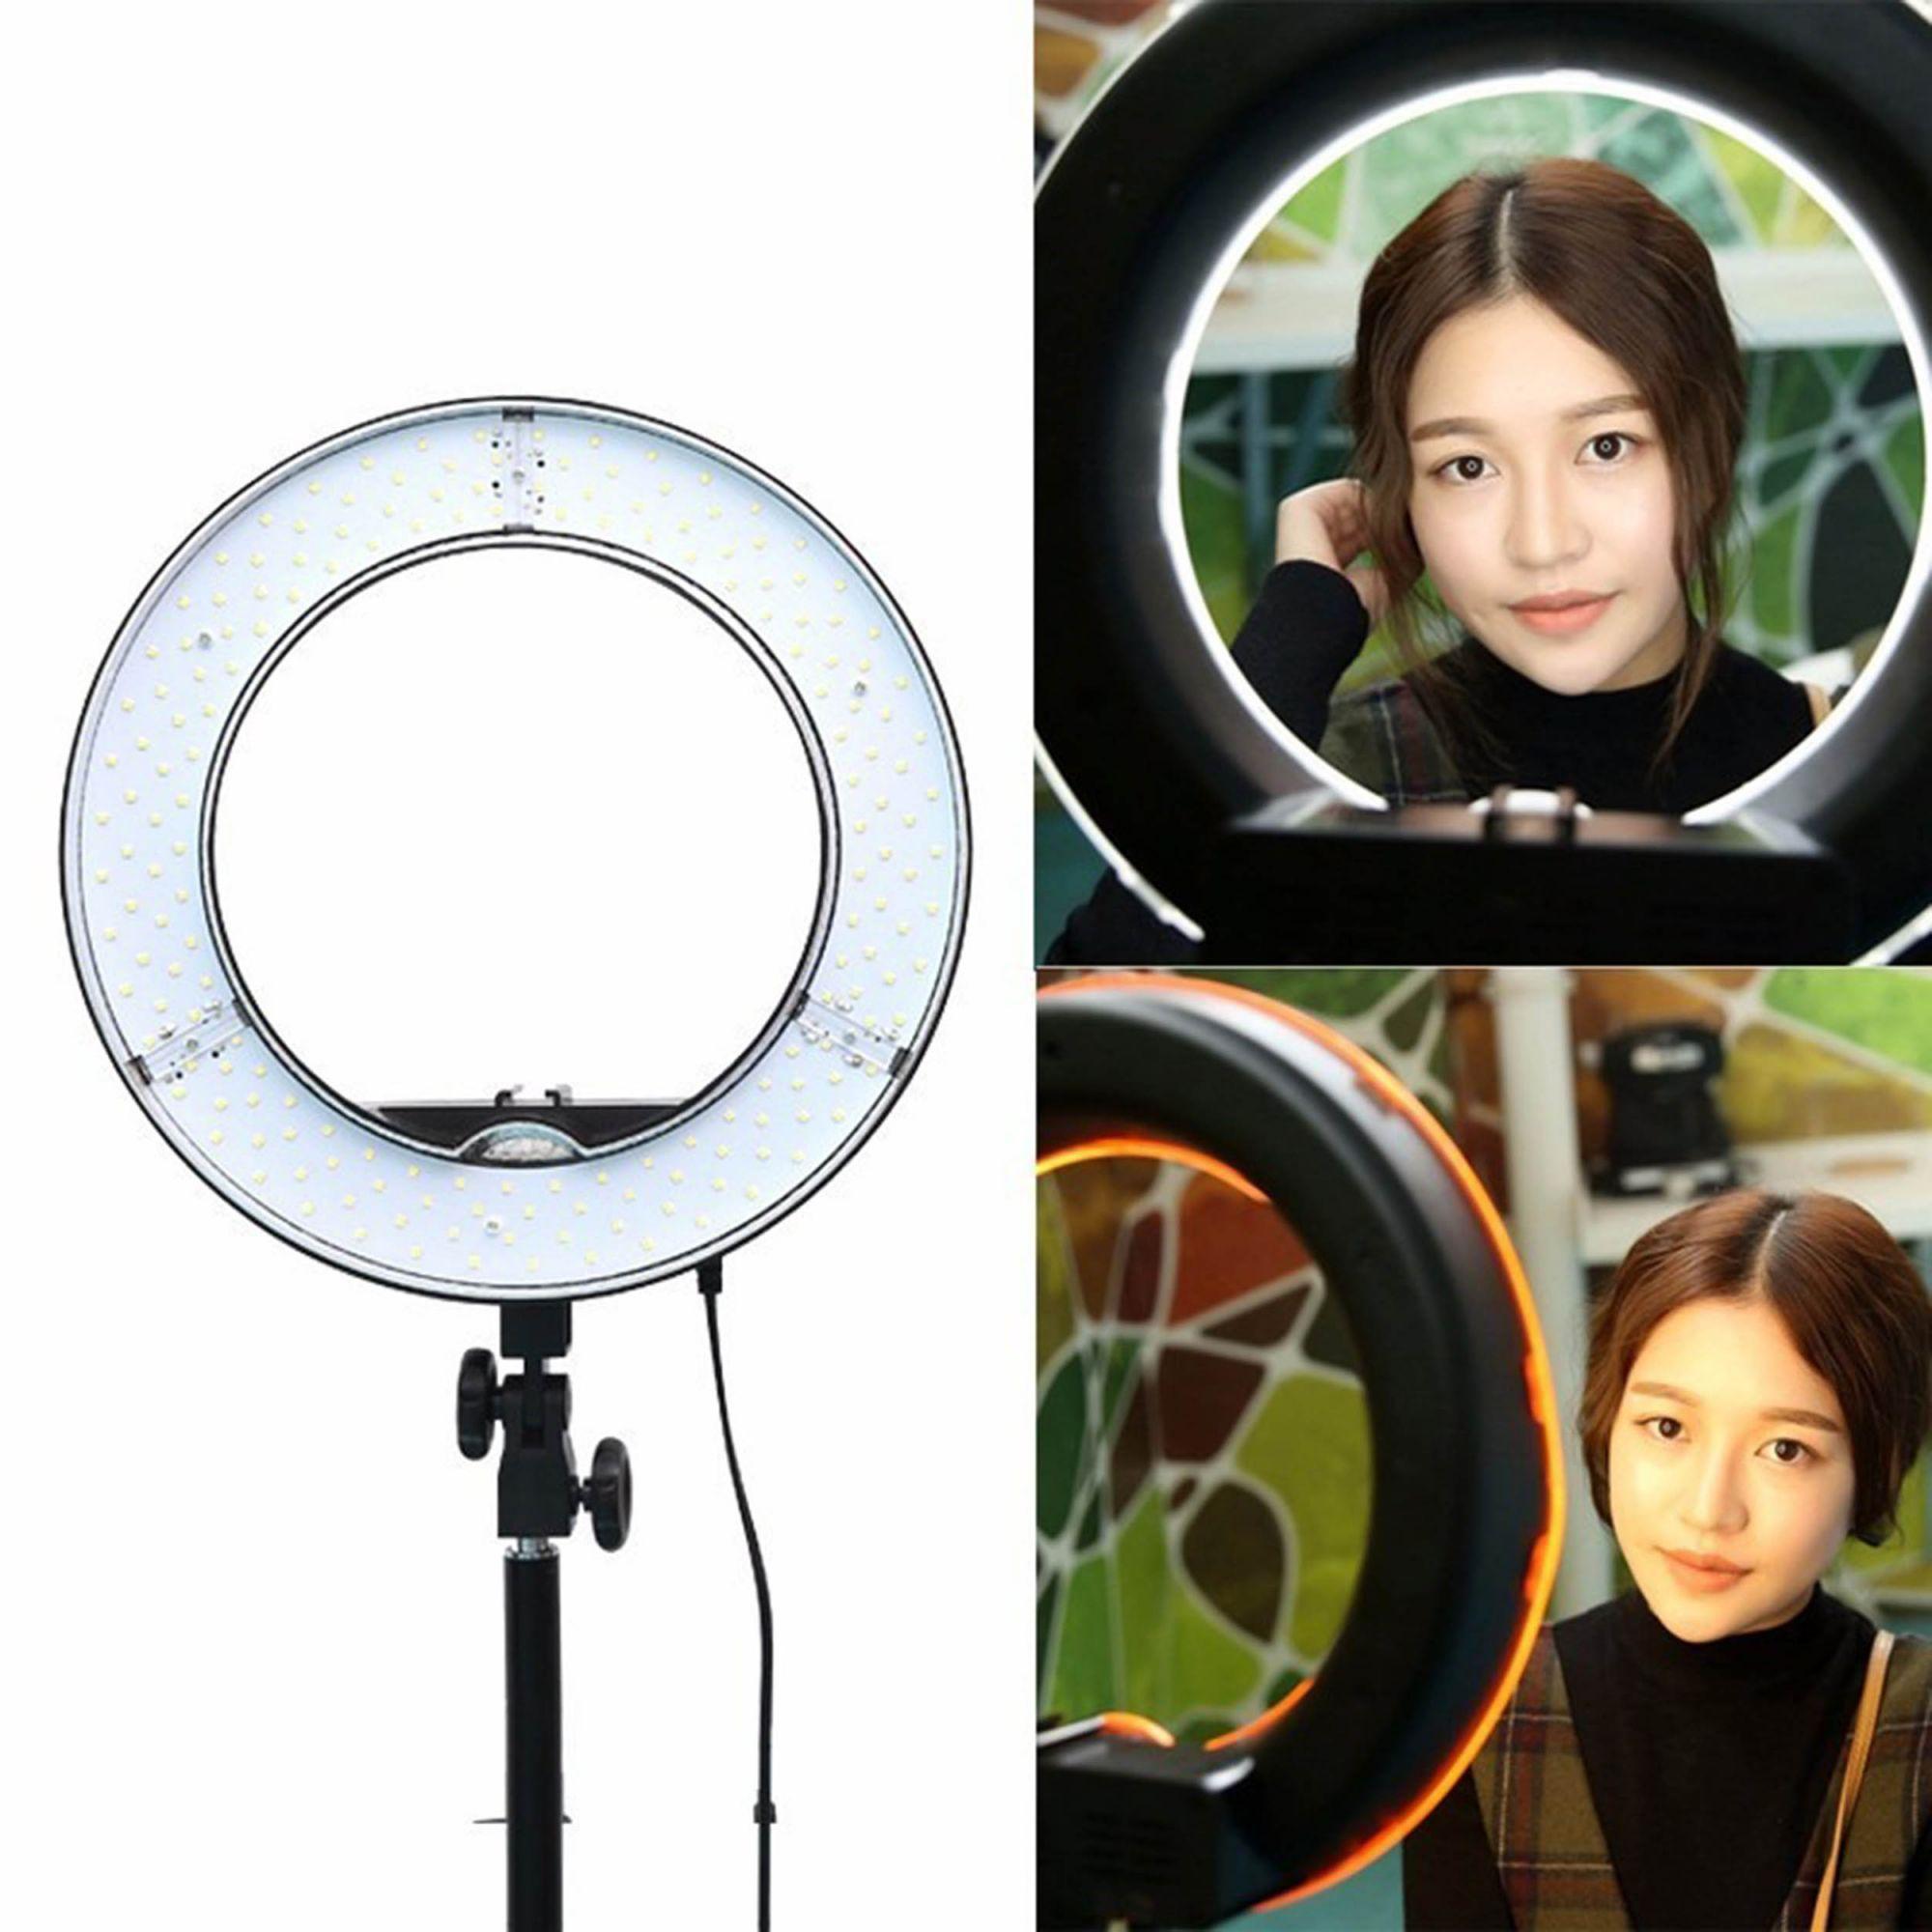 Iluminador Ring Light De Led Rl12 35cm E Tripé 2 metros